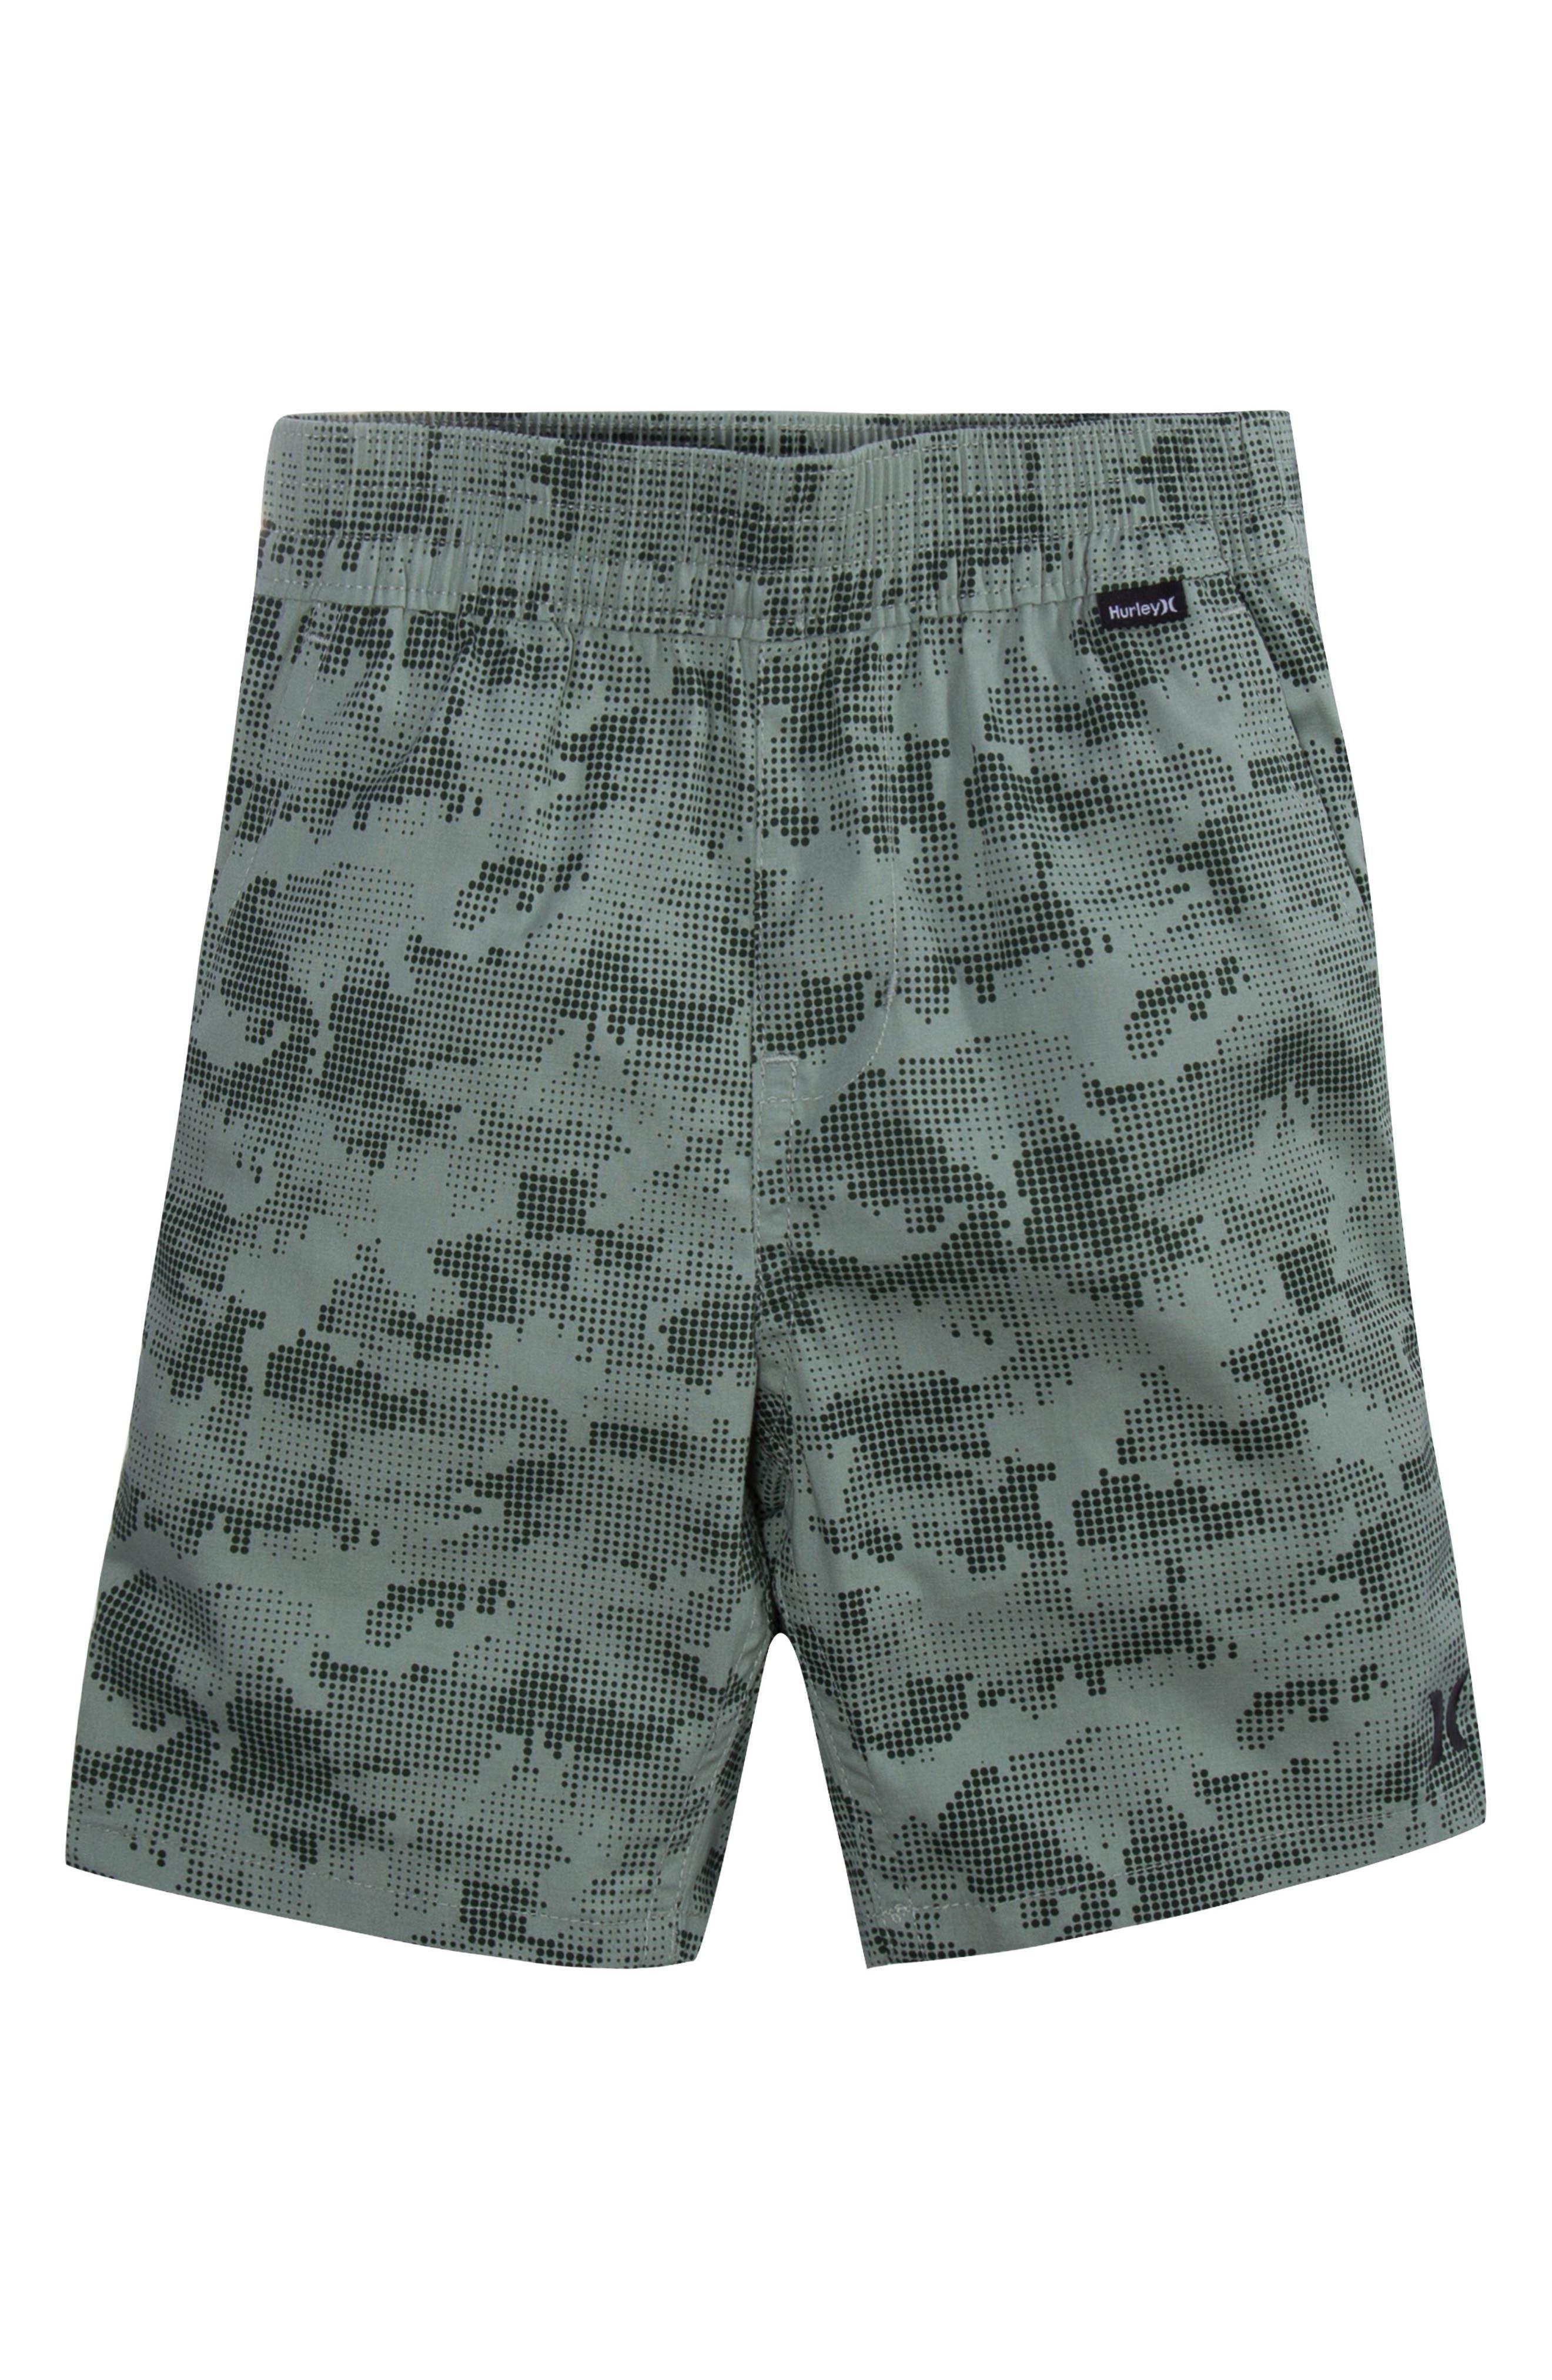 Poplin Pull-On Shorts,                         Main,                         color, Clay Green